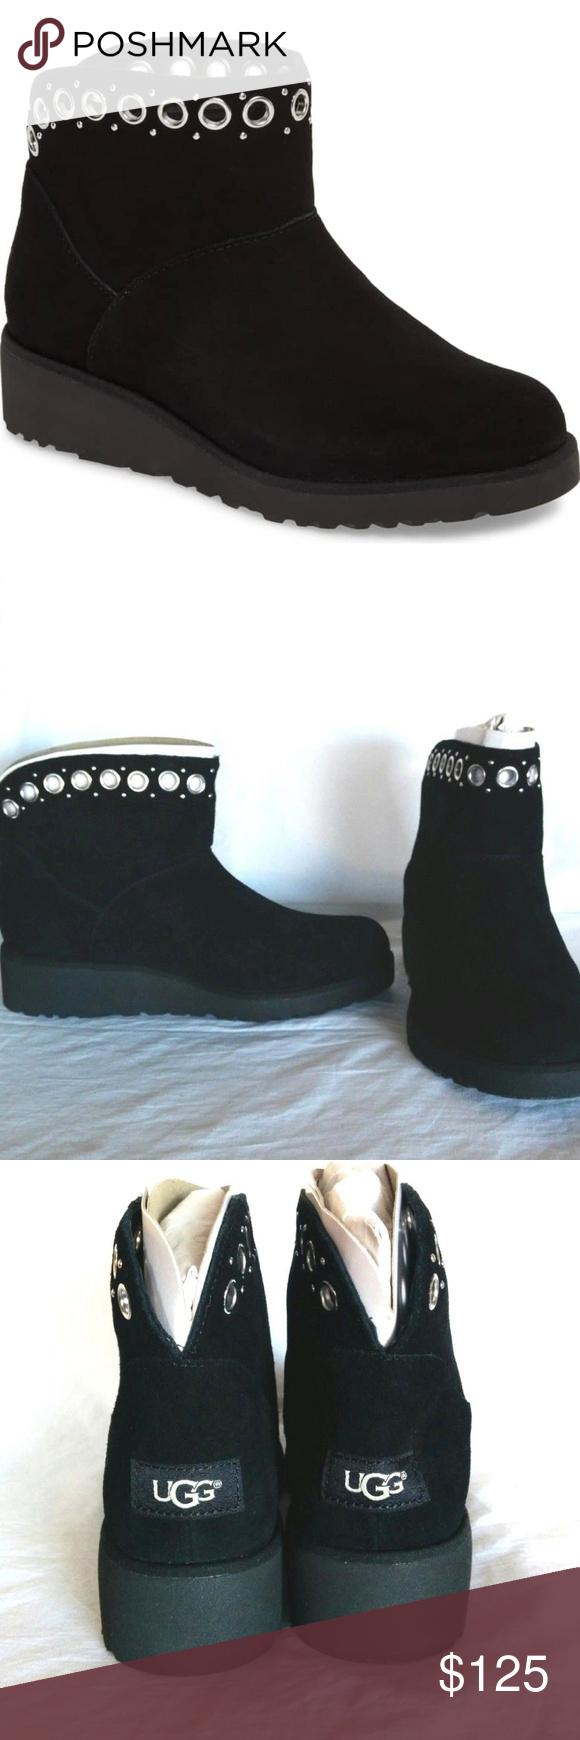 96204389d273 NIB UGG Riley Grommet Mini Boot Bootie New with box Women s Riley Grommet  Mini Suede Sheepskin